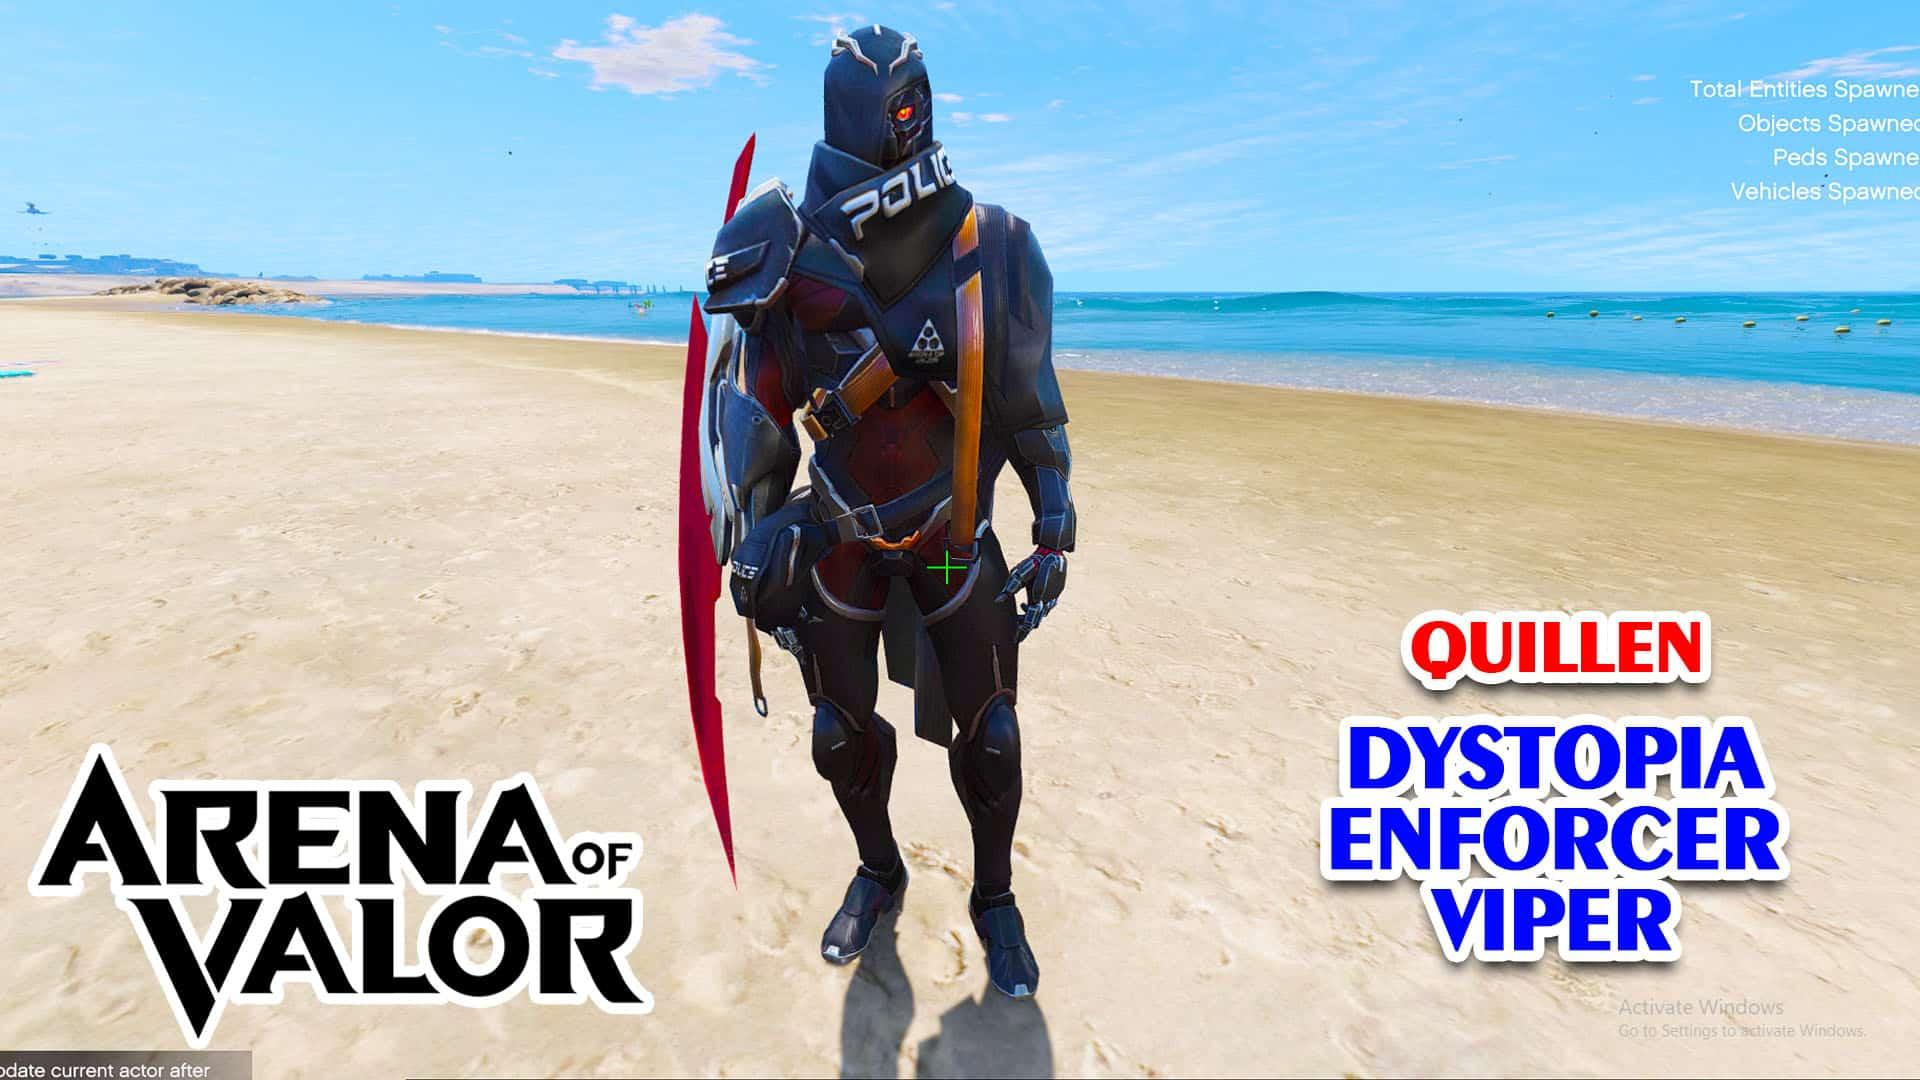 GTA 5 Mod Quillen Dystopia Enforcer Viper Arena of Valor